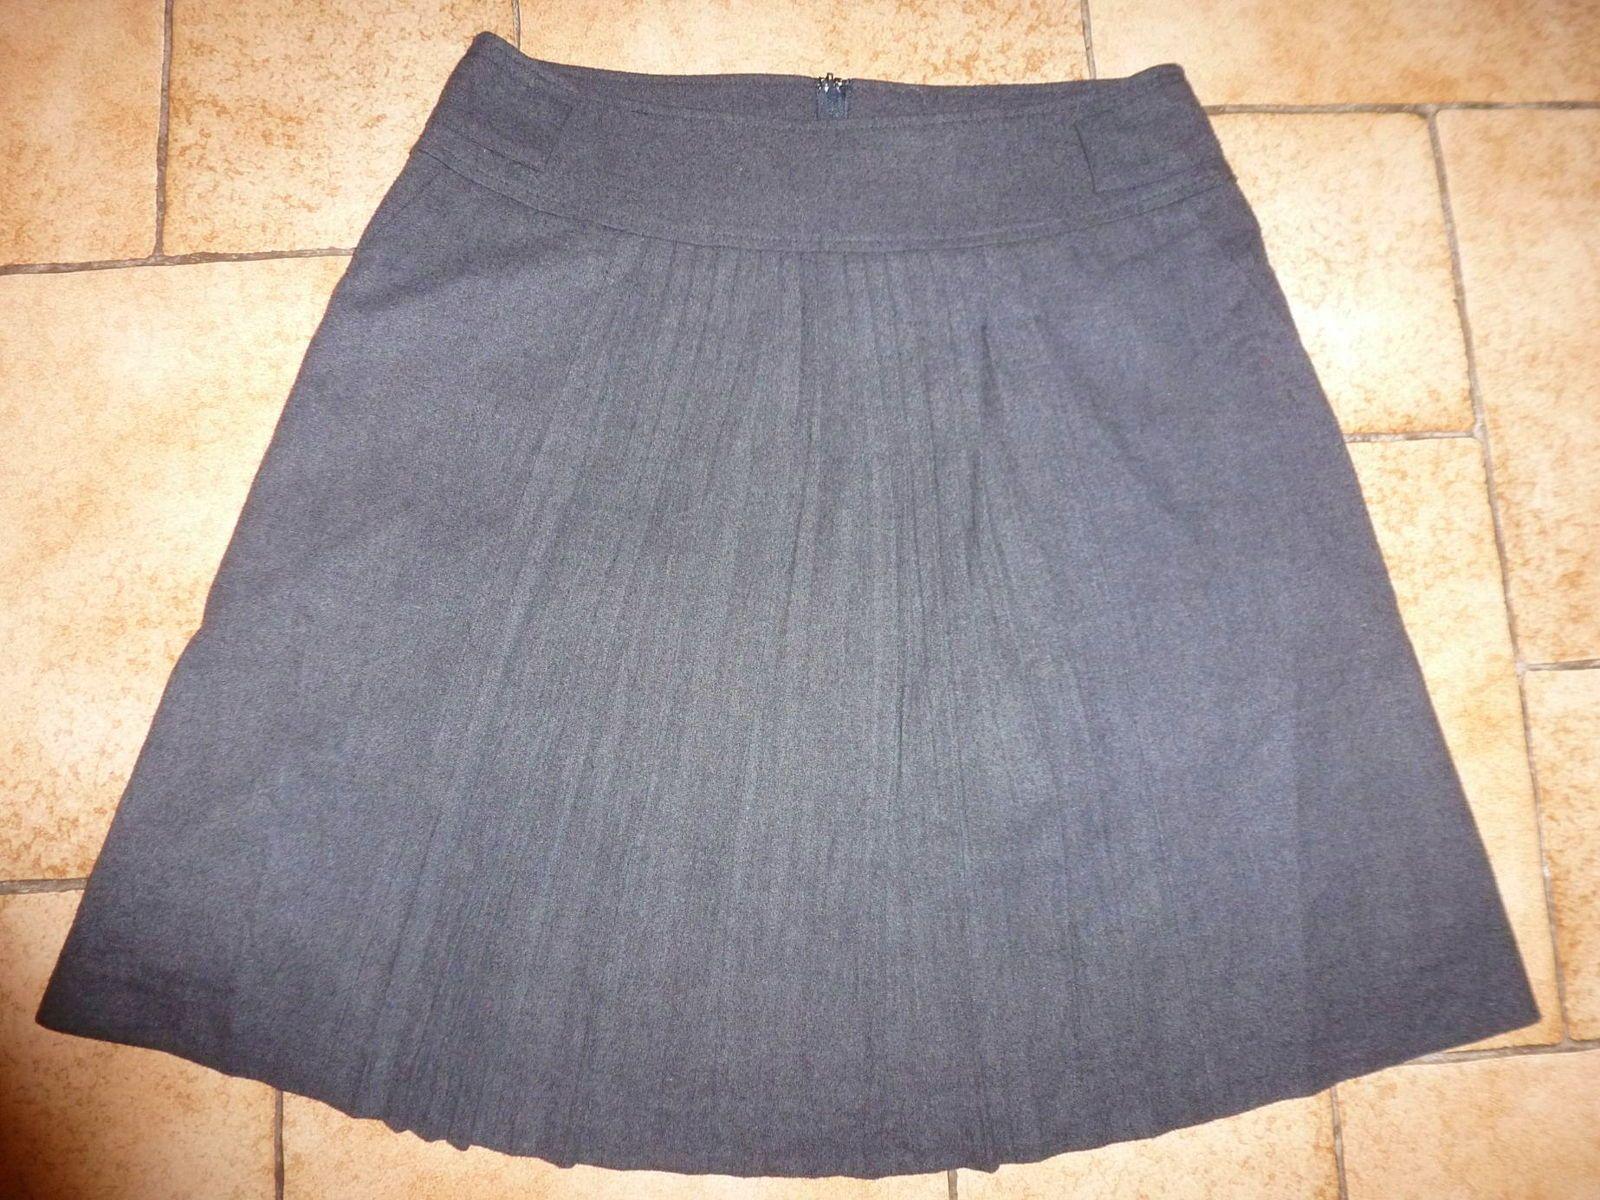 Jupe plissée lainage taille 40neuve